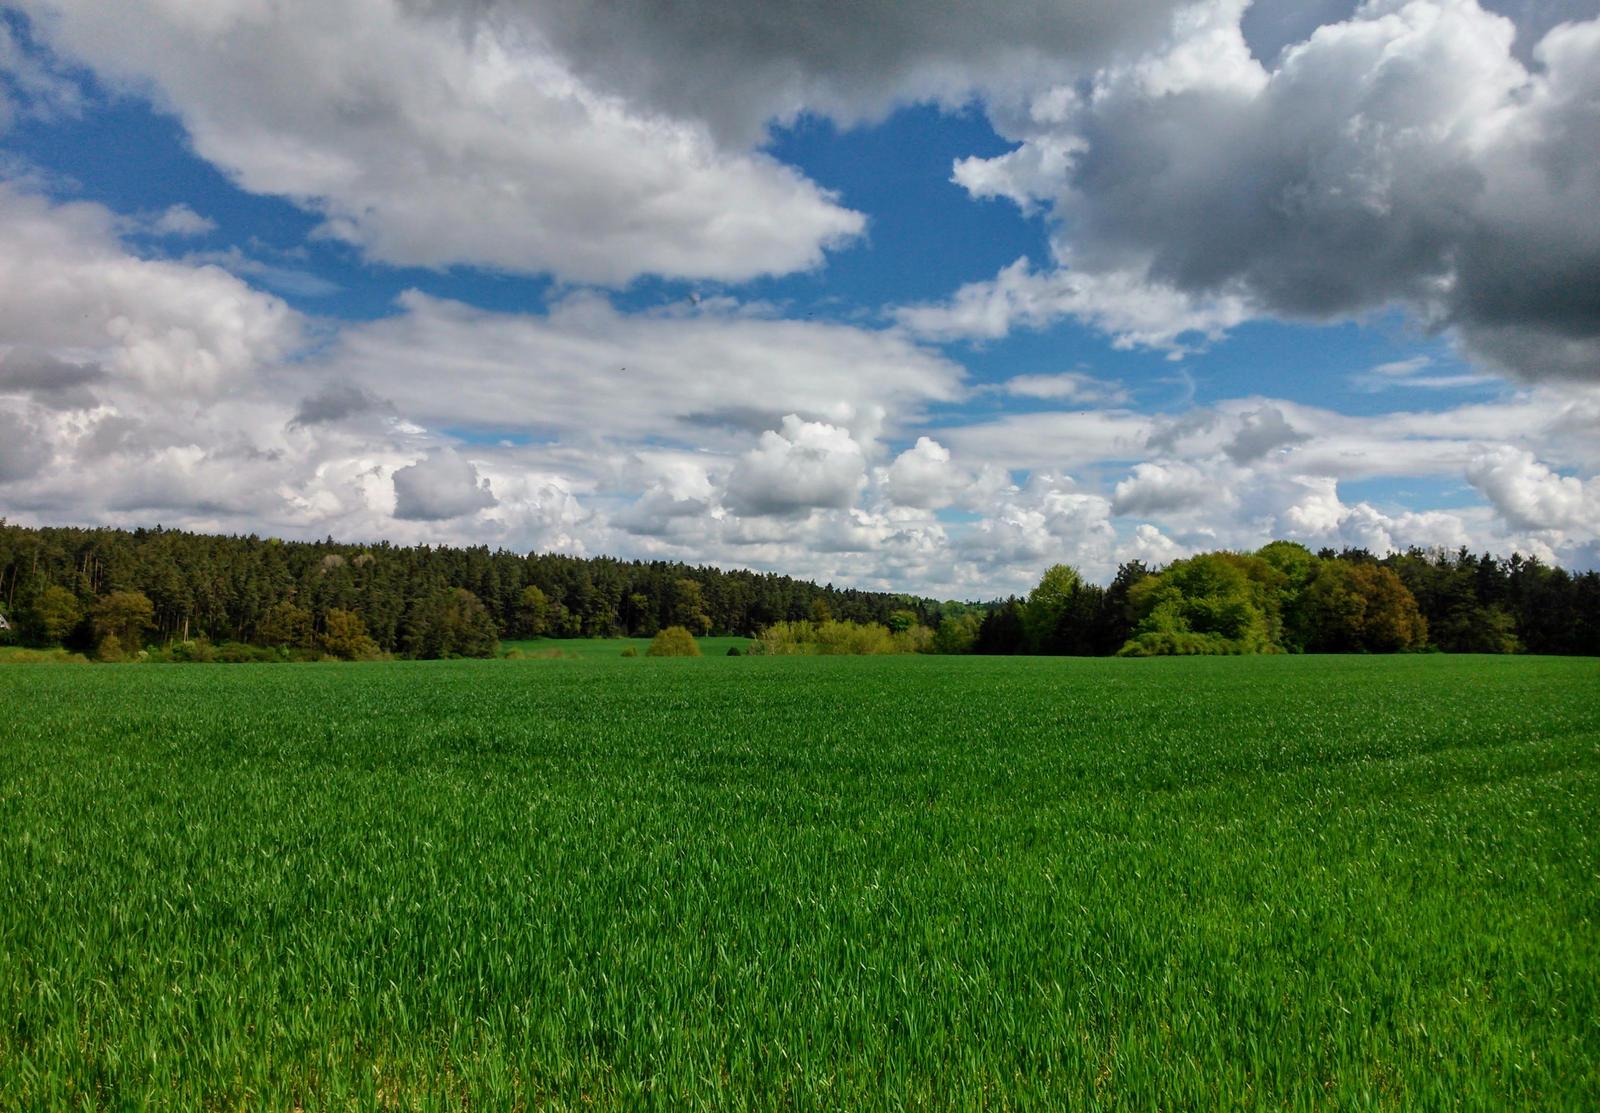 clouds by Mittelfranke